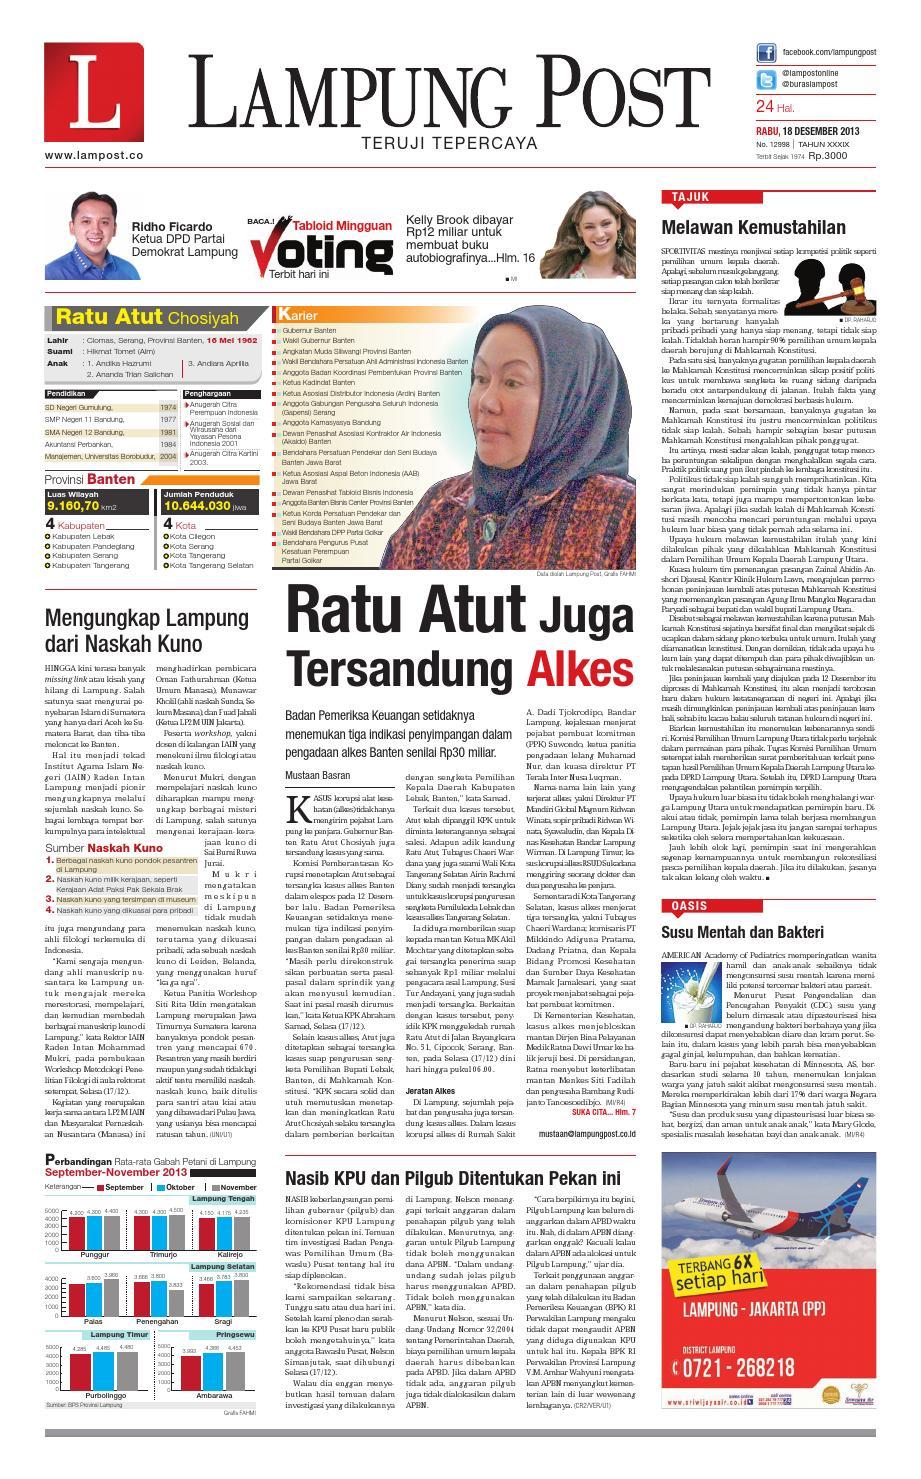 Lampung Post Rabu 18 Desember 2013 By Issuu Yamaha All New Vixion Otr Jabodetabek Banten Perak